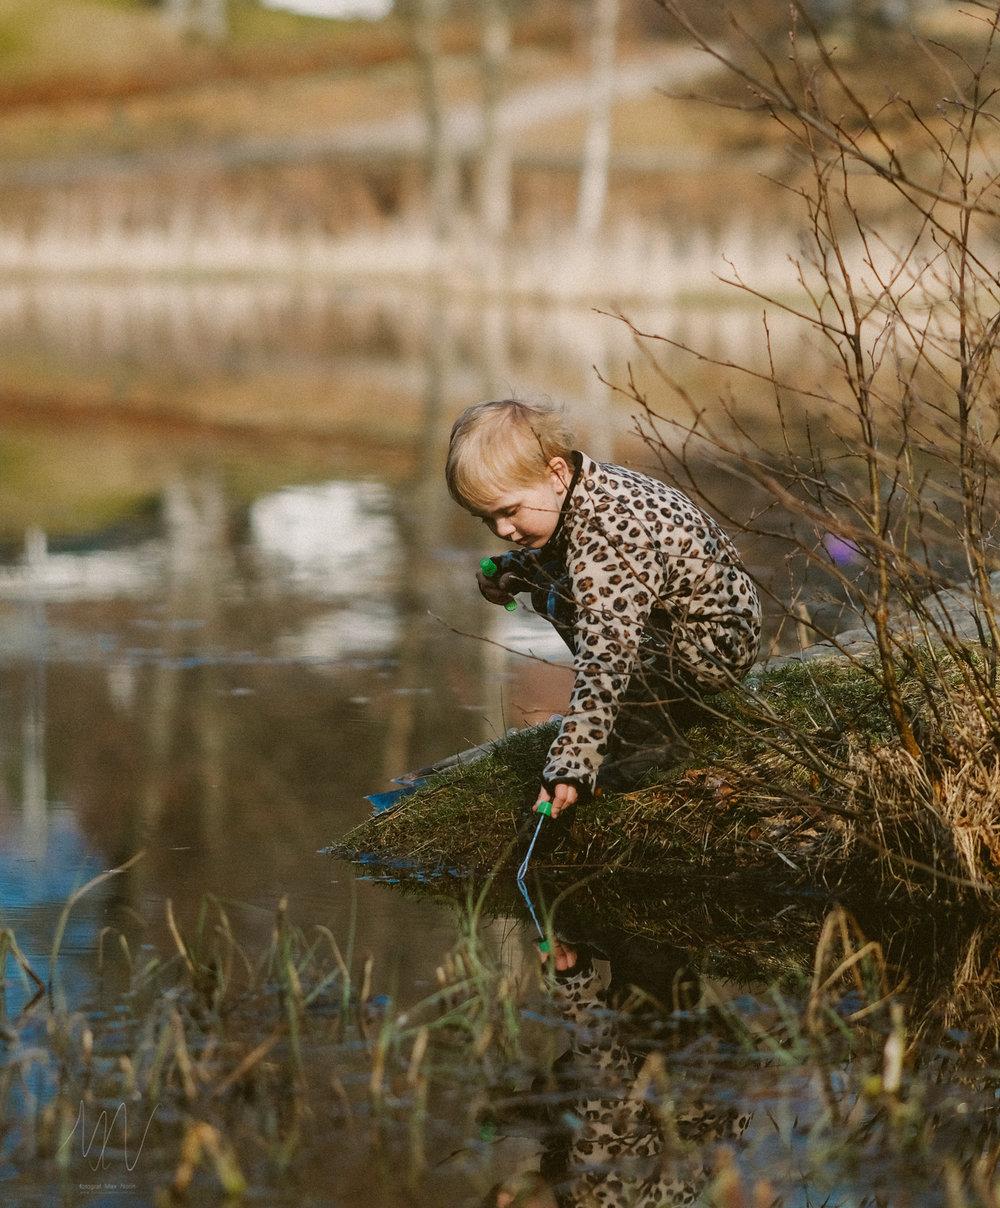 barnfoto-Fotograf-Max-Norin-Borås-2.jpg